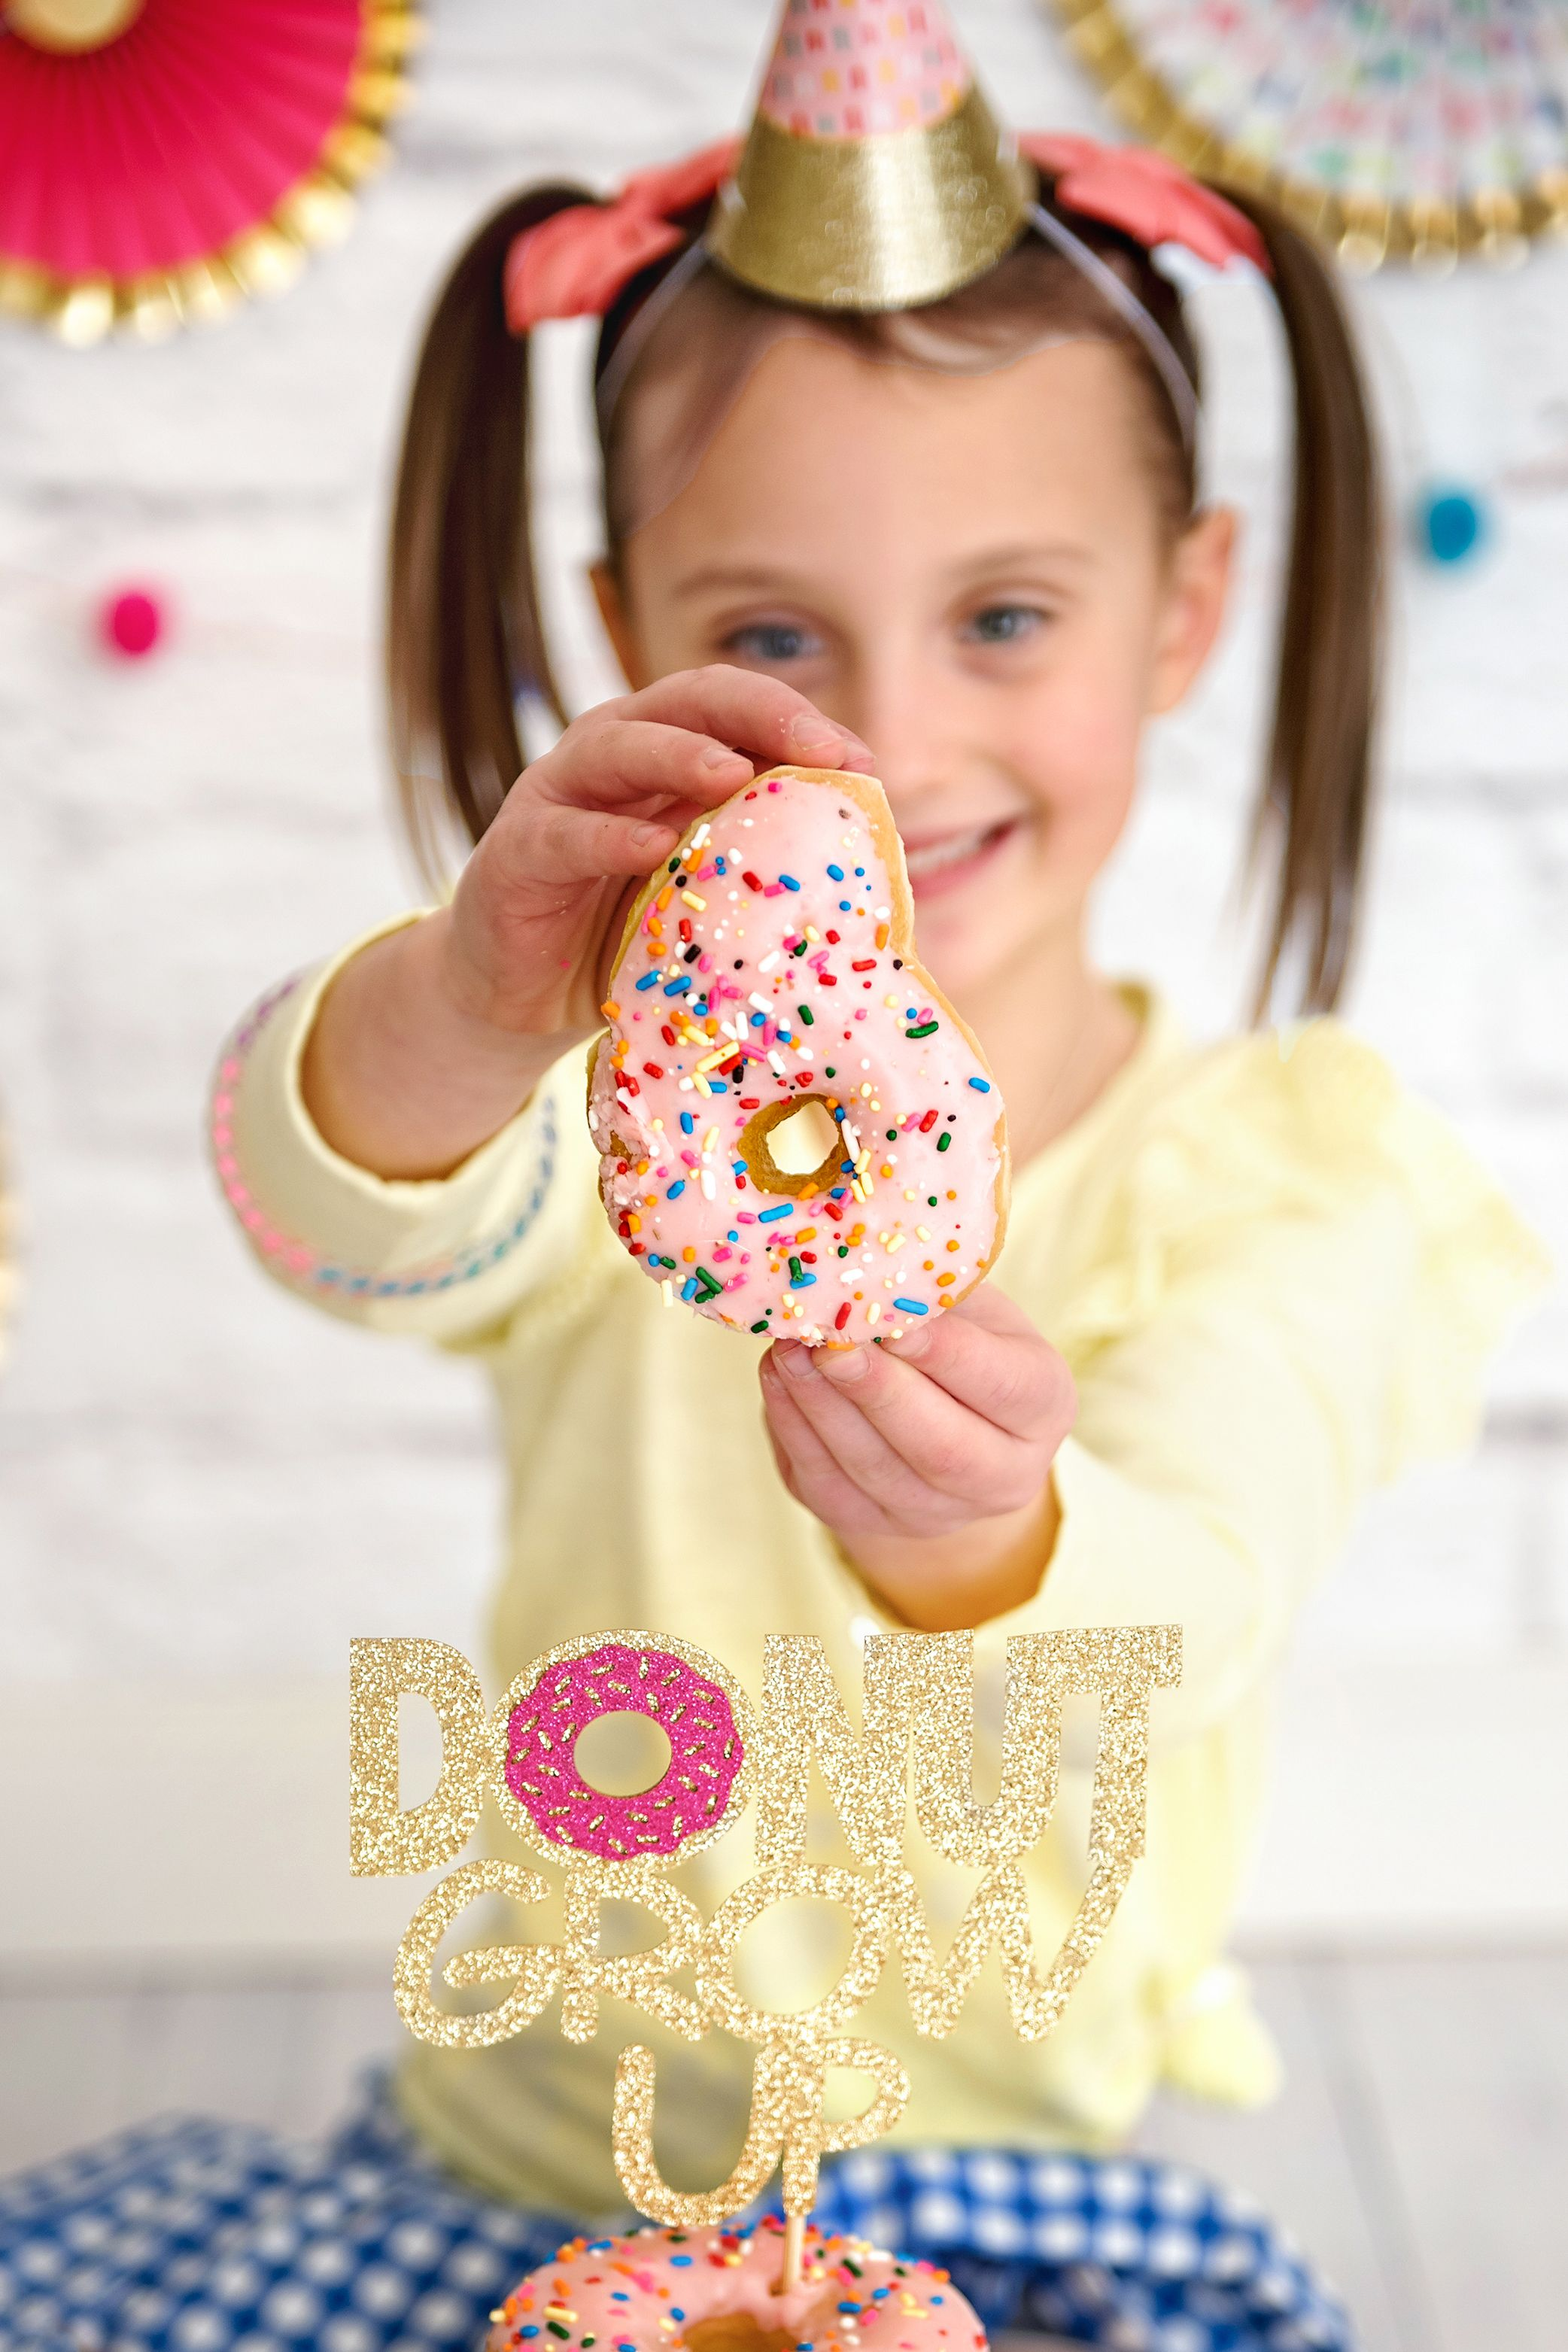 Donut Grow Up Party Donut Birthday Smash Cake Donut Party